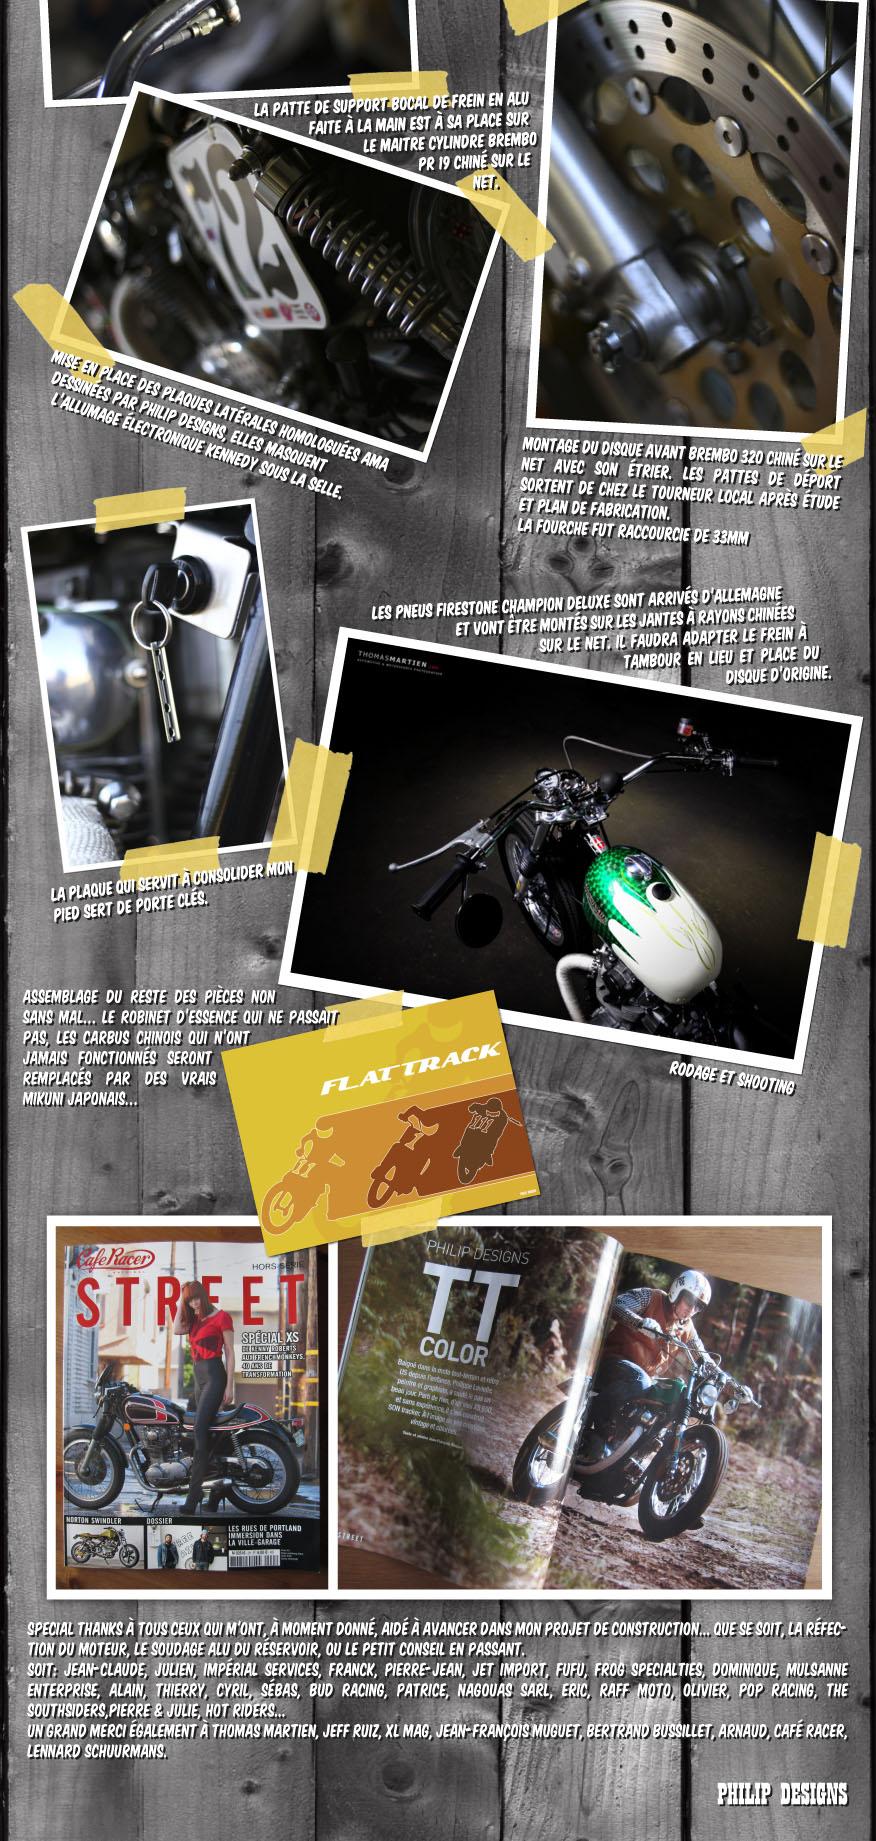 philip designs motorcycle 650 xs